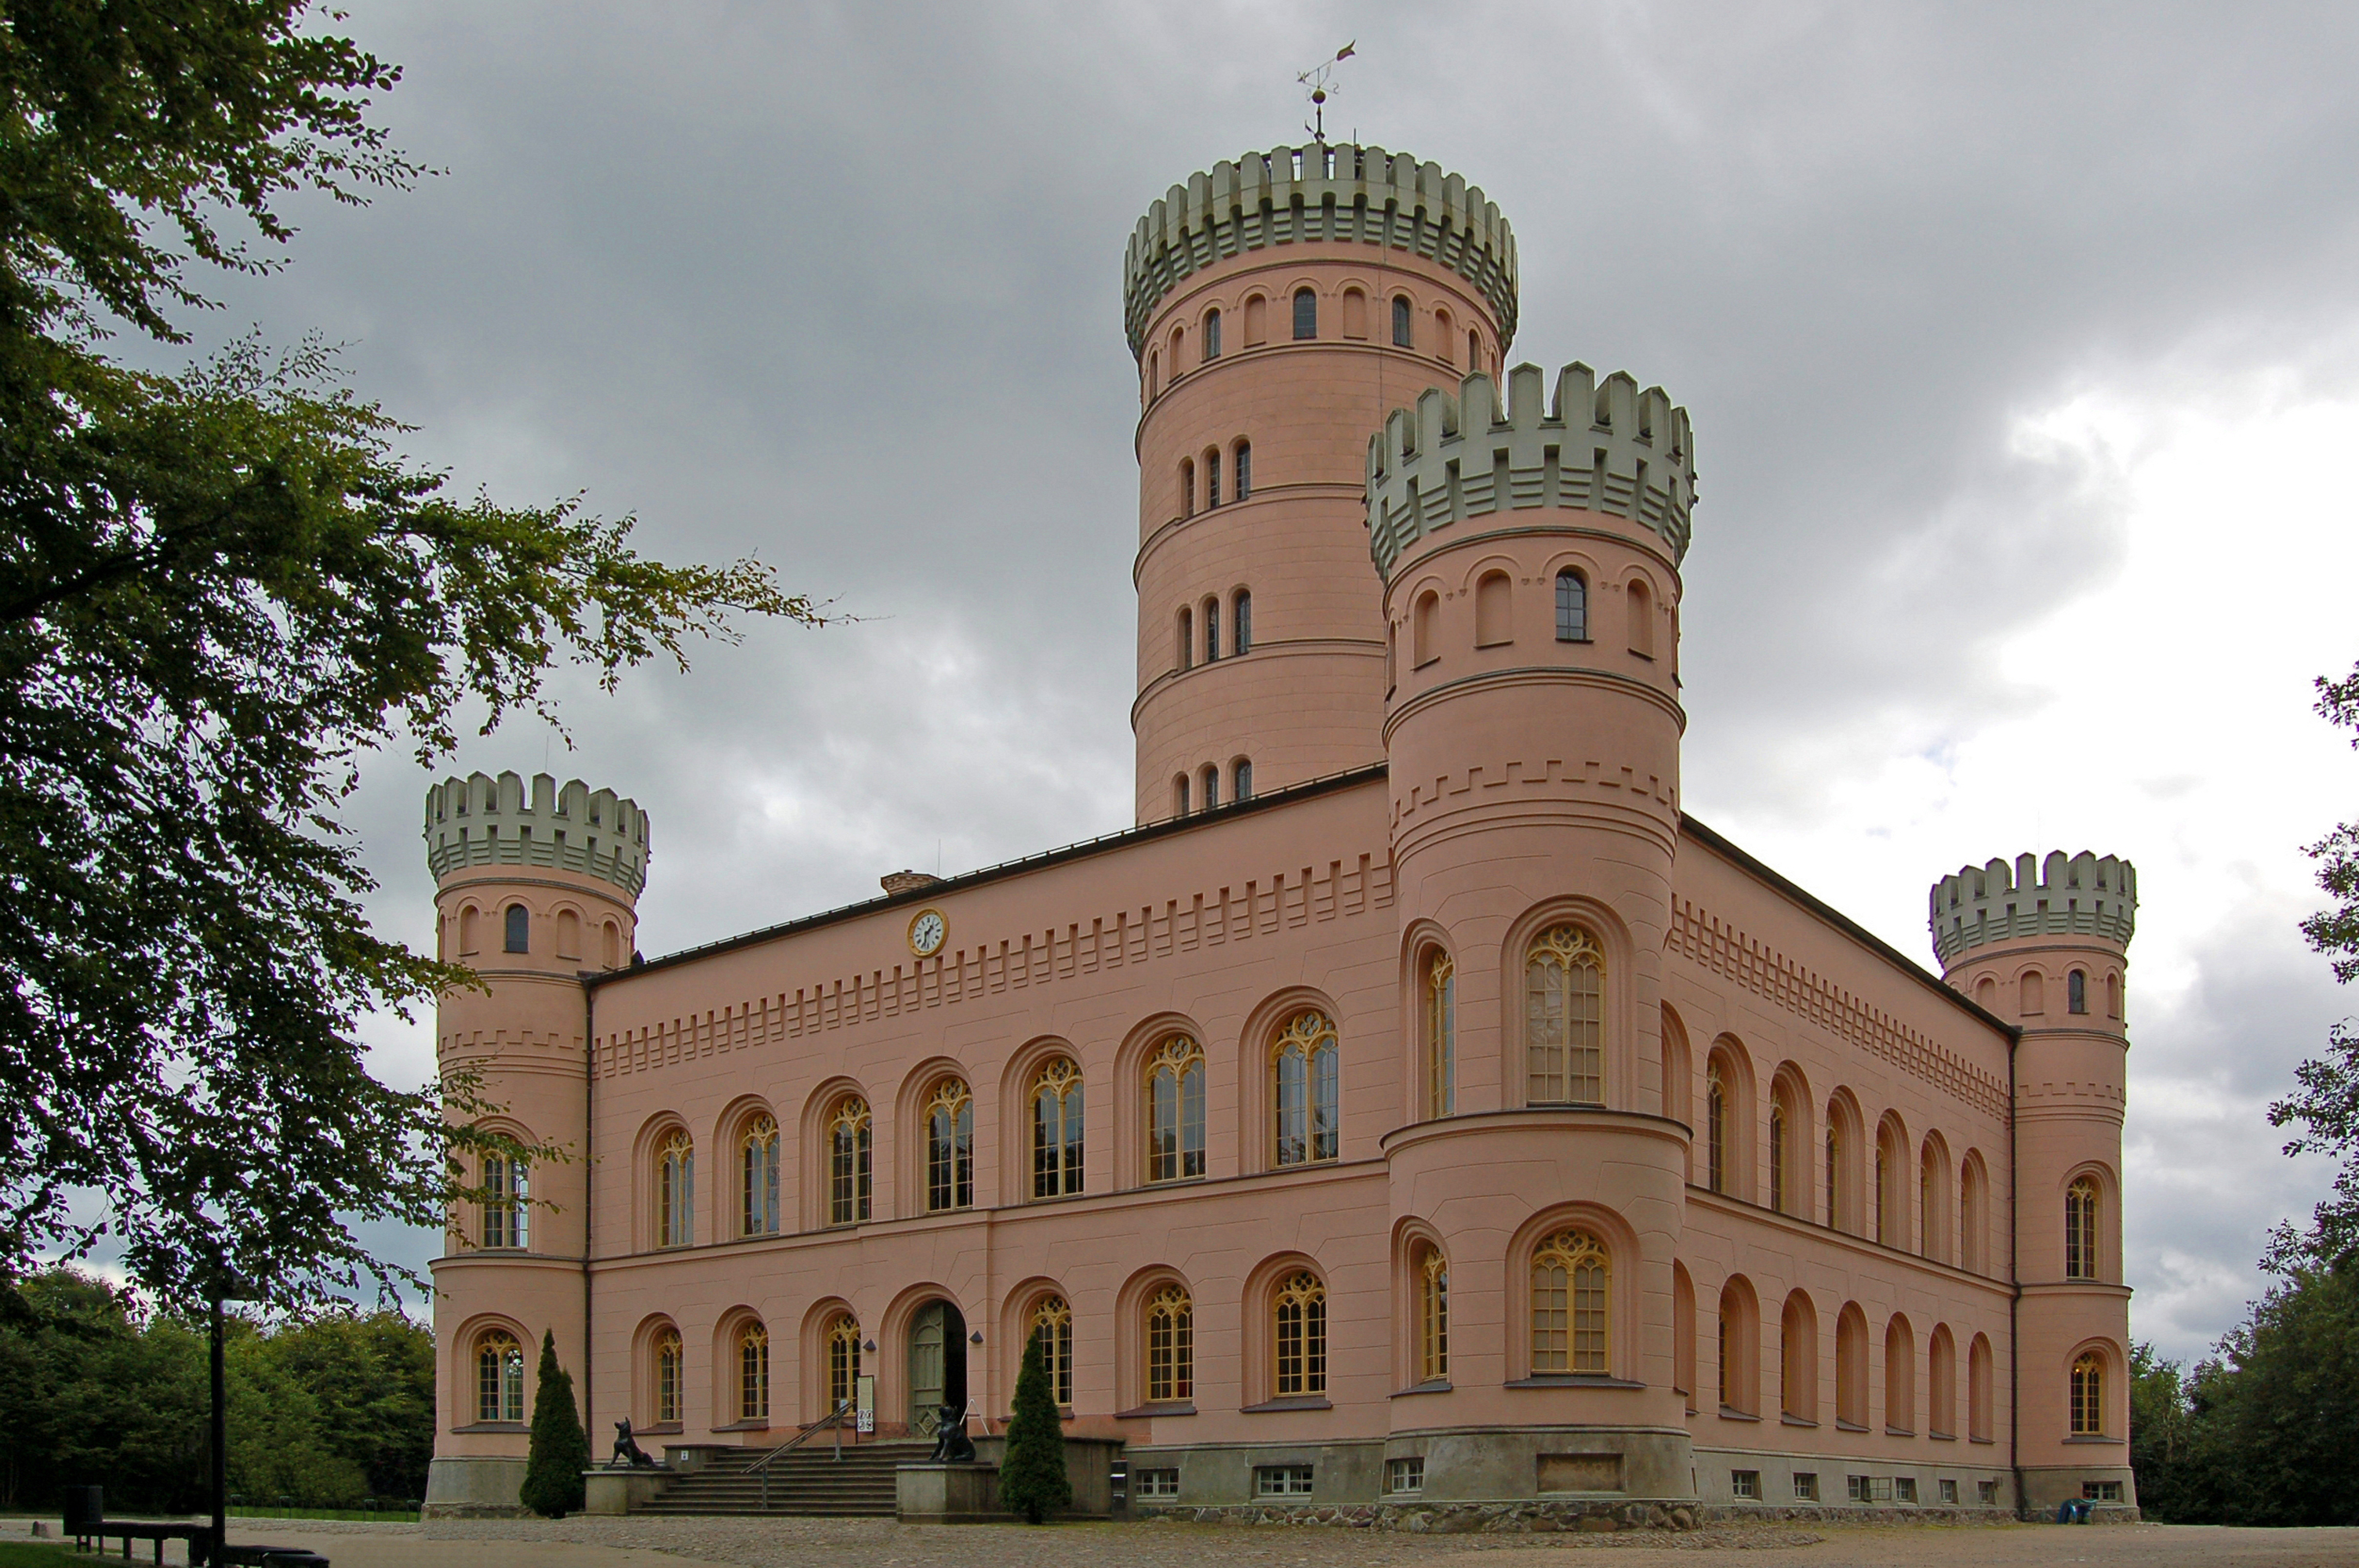 Jagdschloss Granitz bei Binz auf Rügen (01)